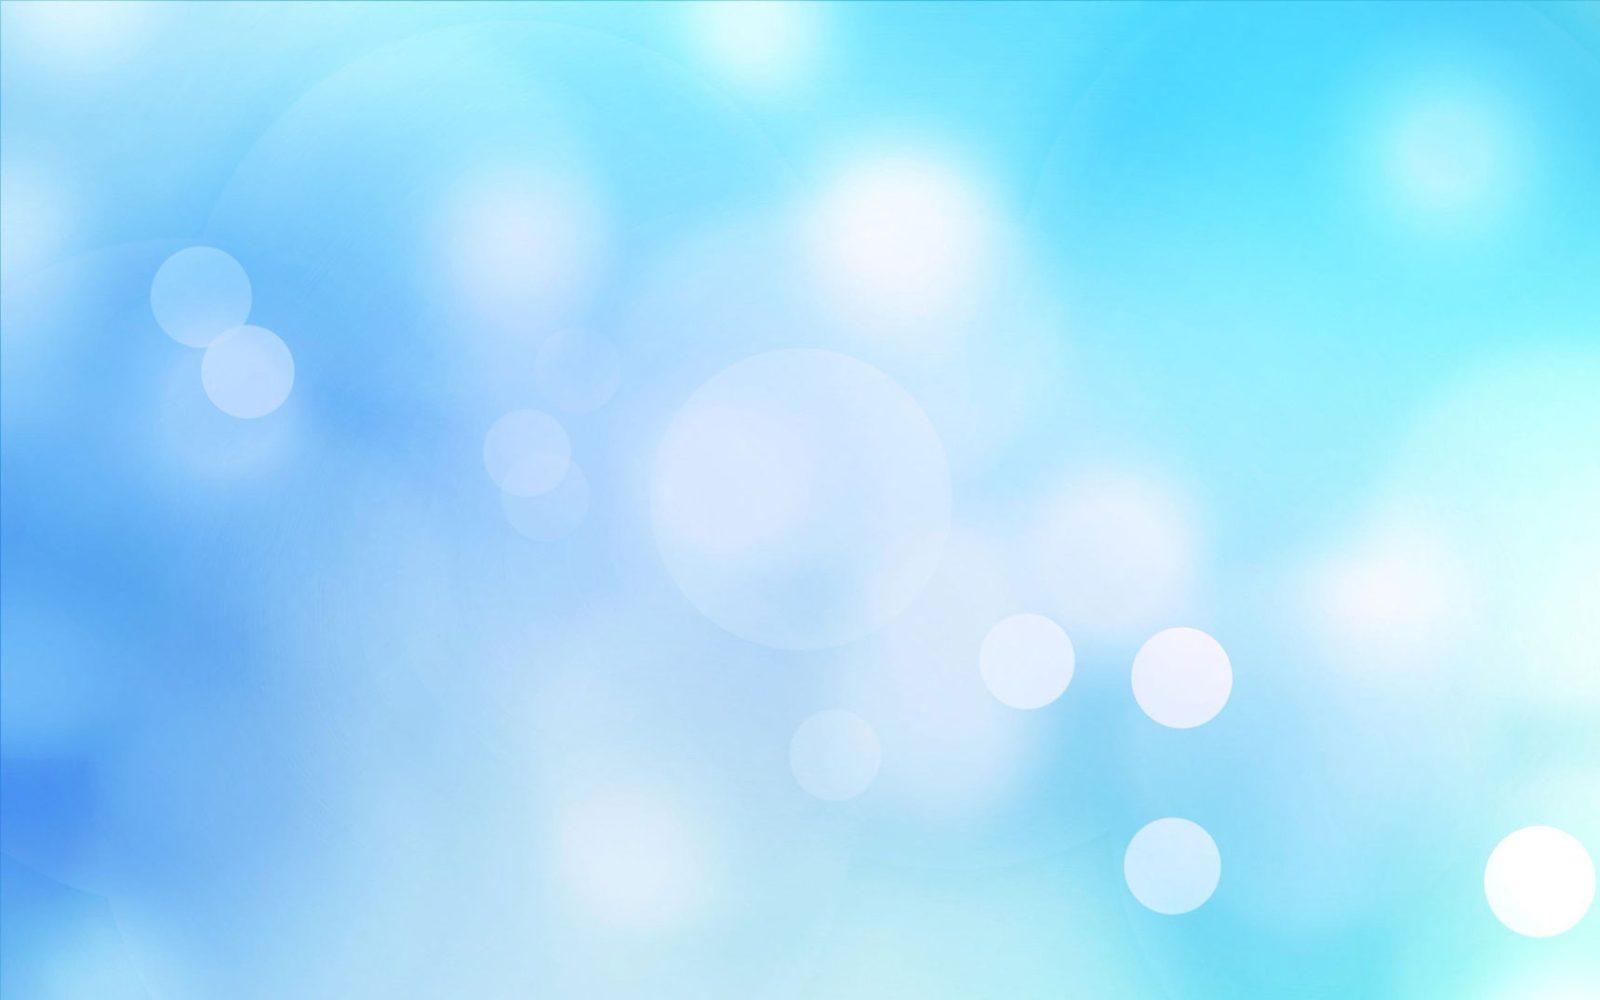 irconsole-background-2